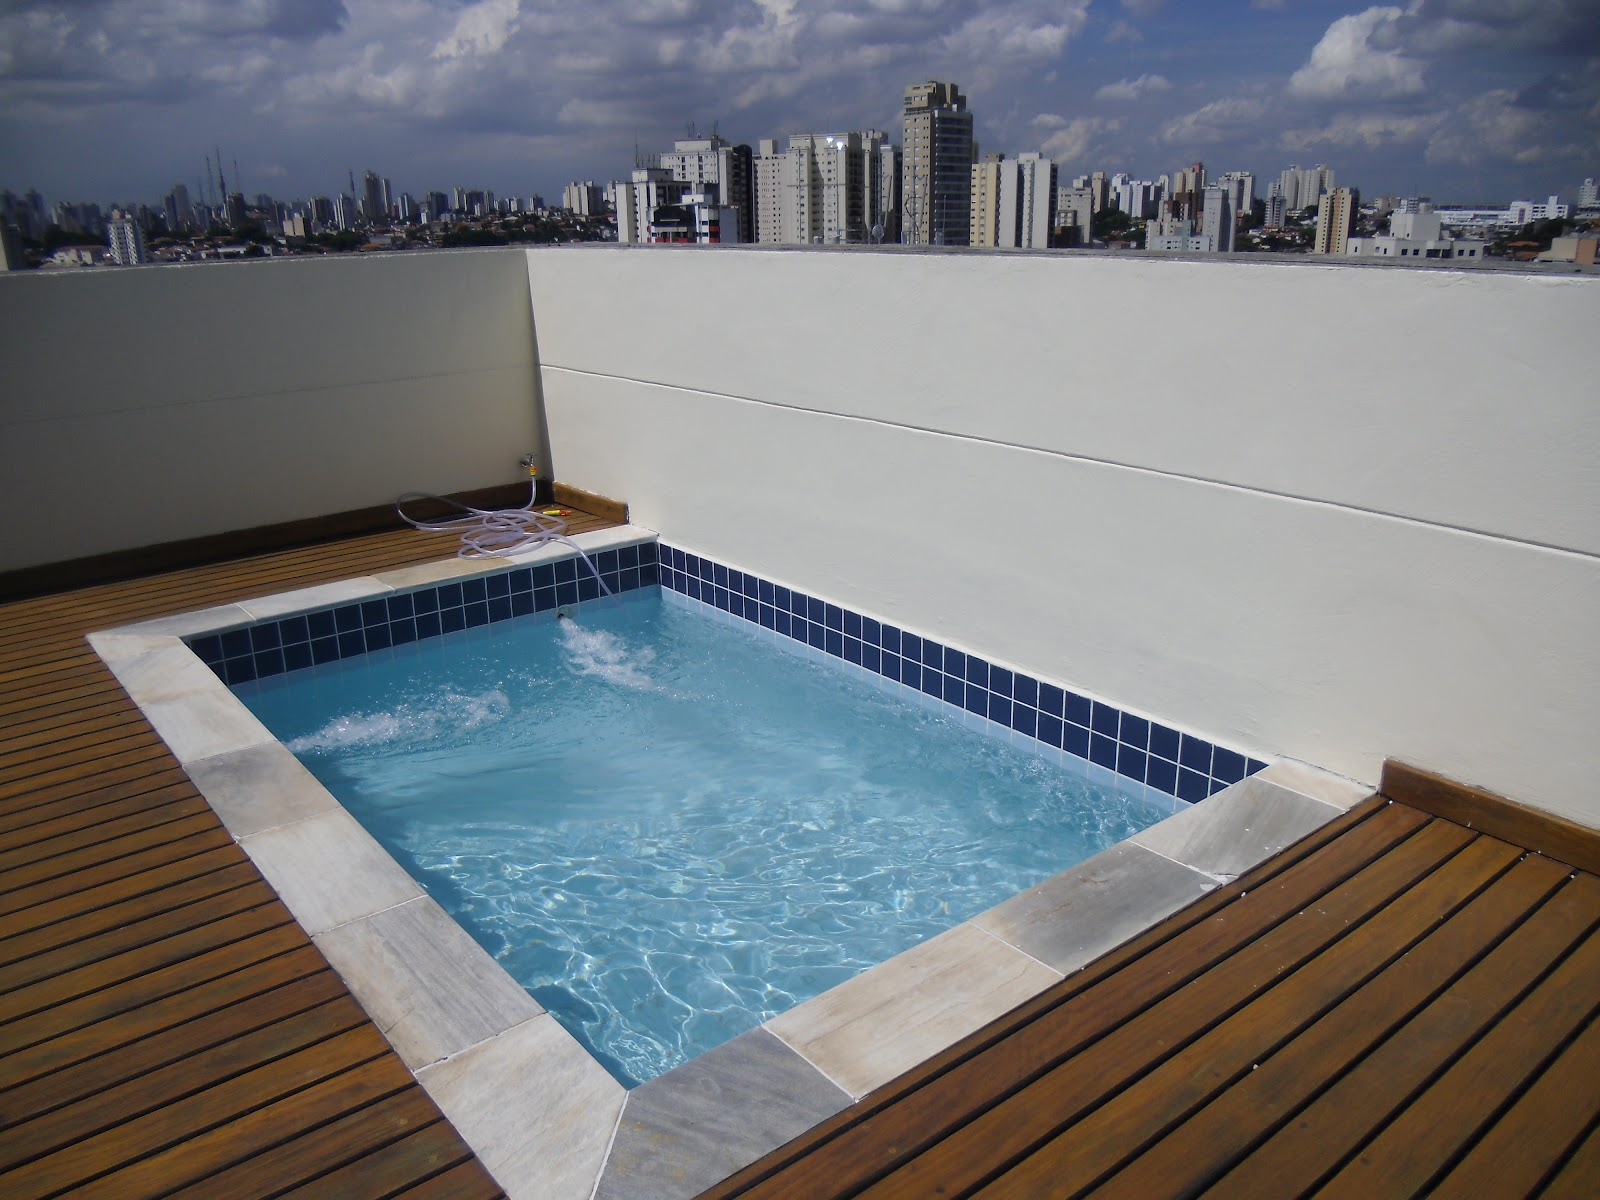 Thonho piscinas piscina residencial for Piscina 7 mil litros